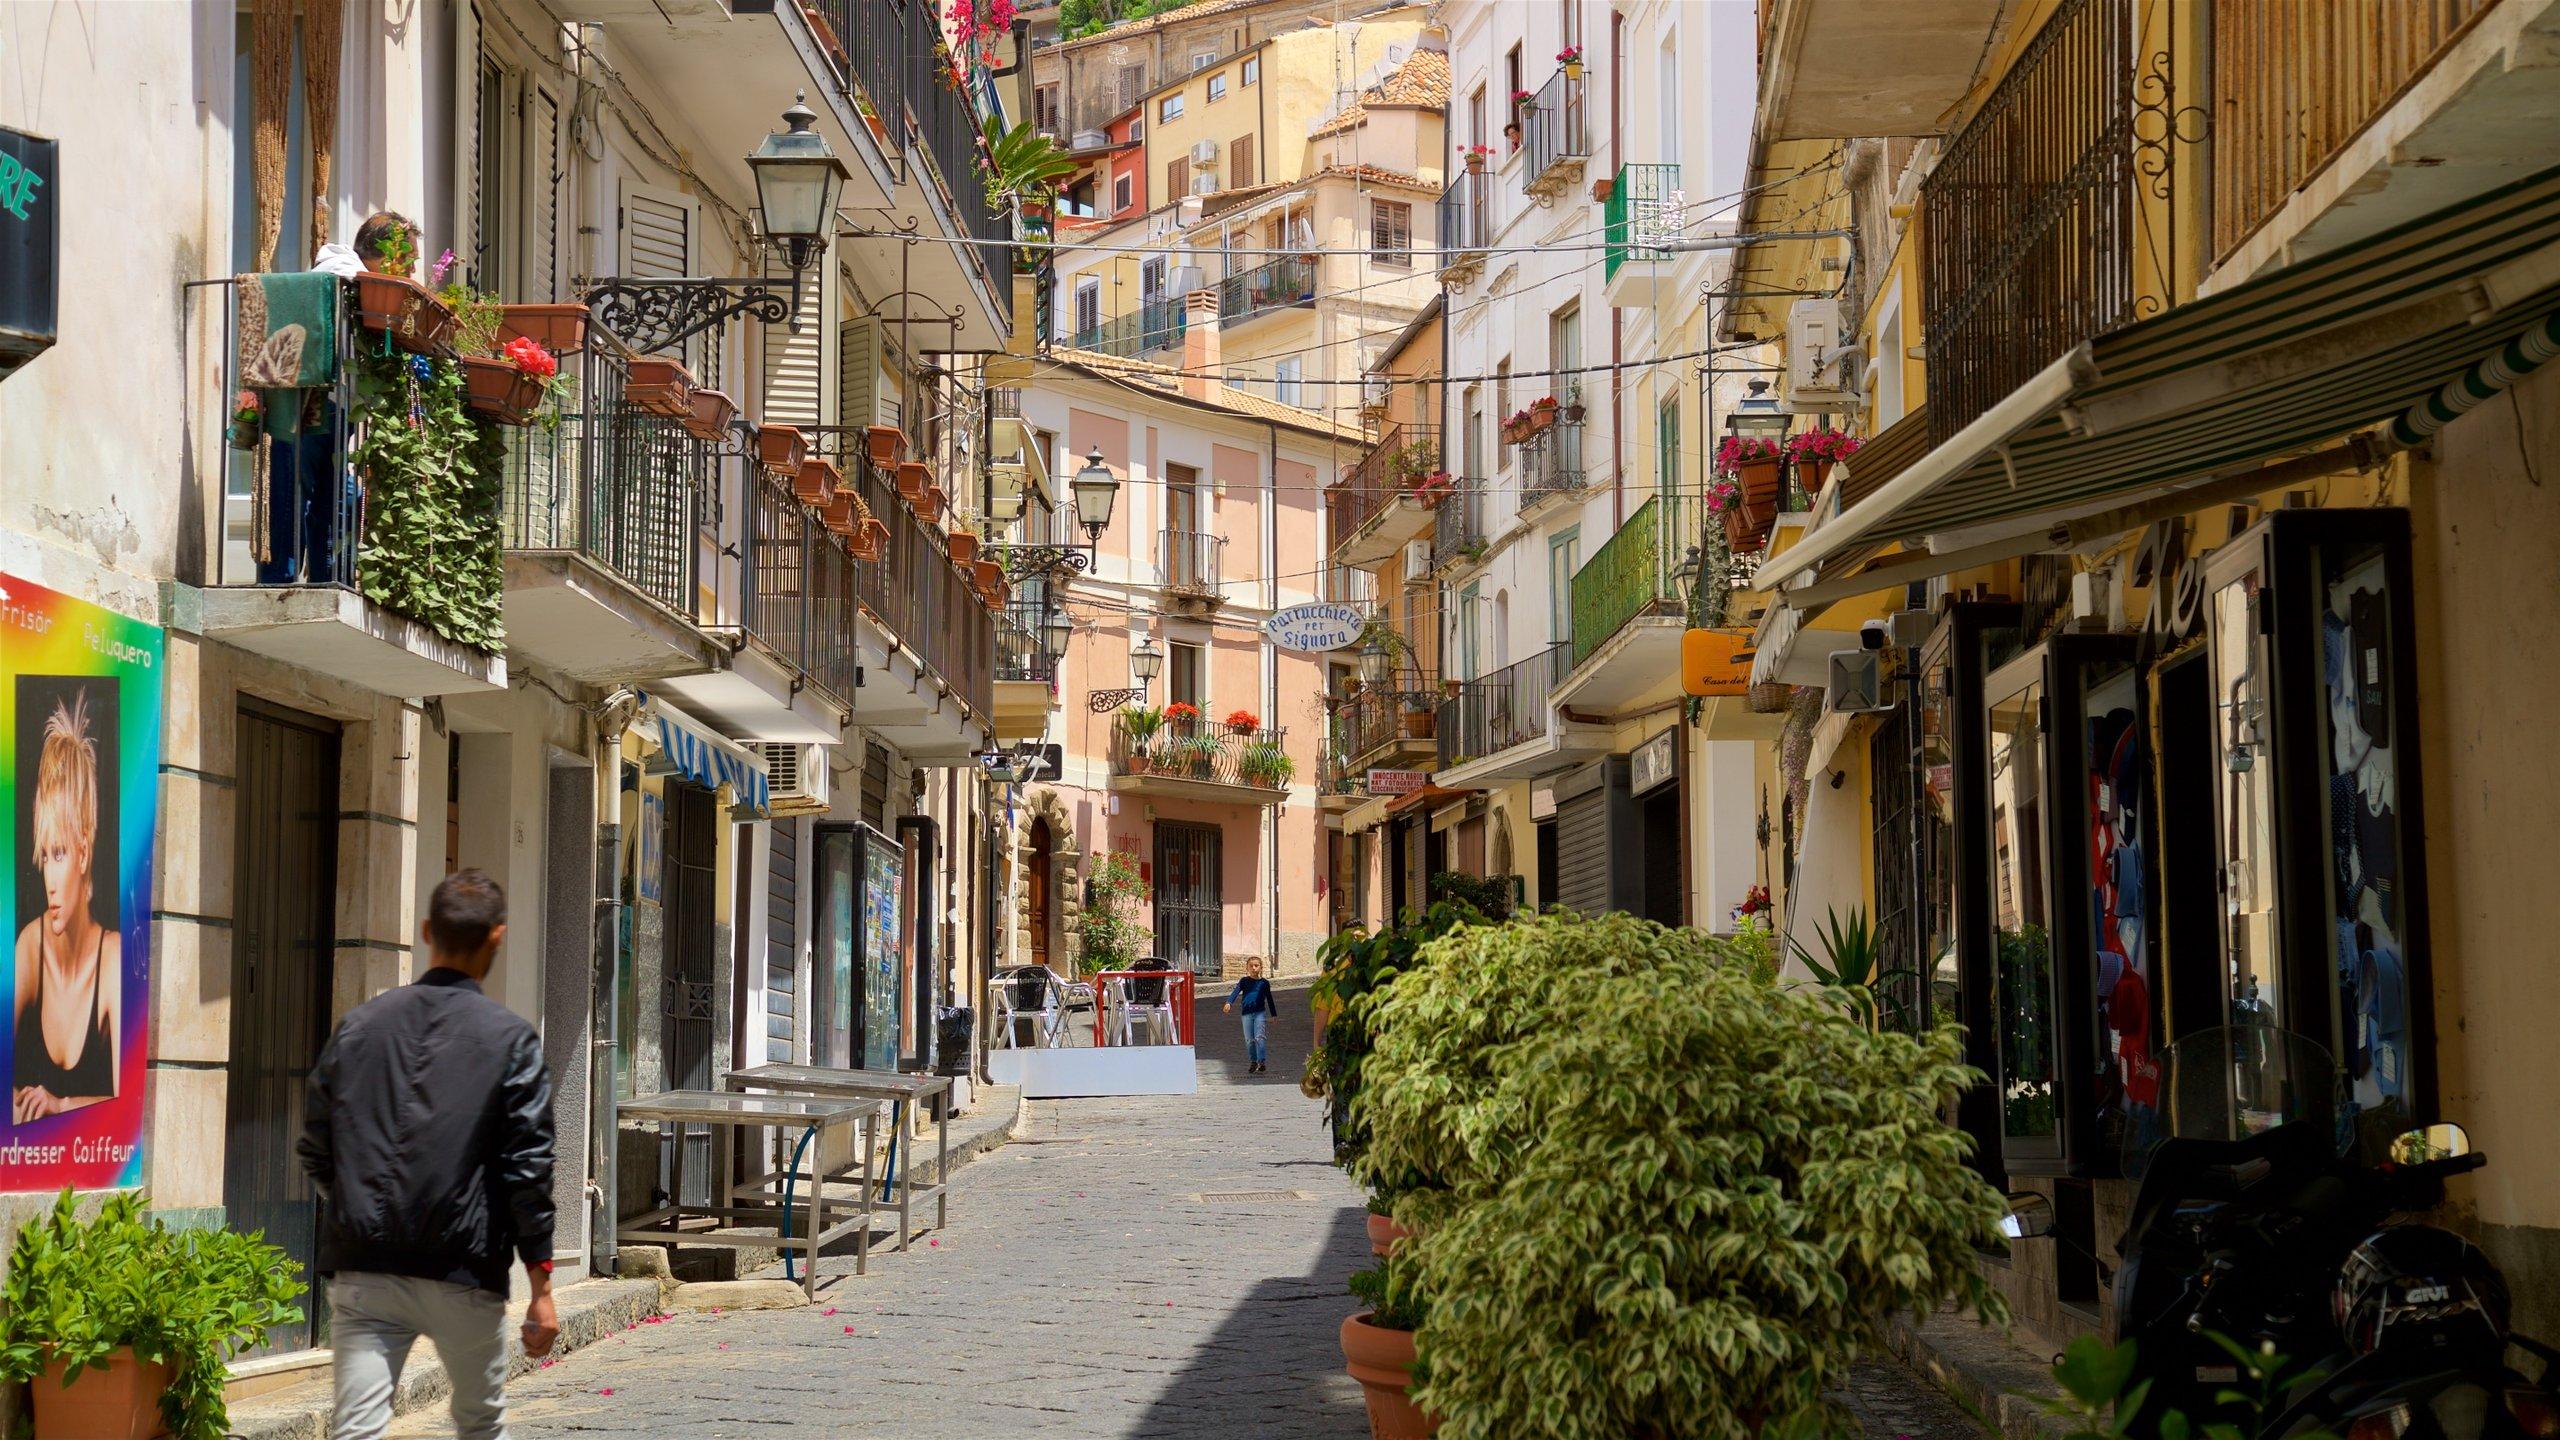 Pizzo, Calabre, Italie